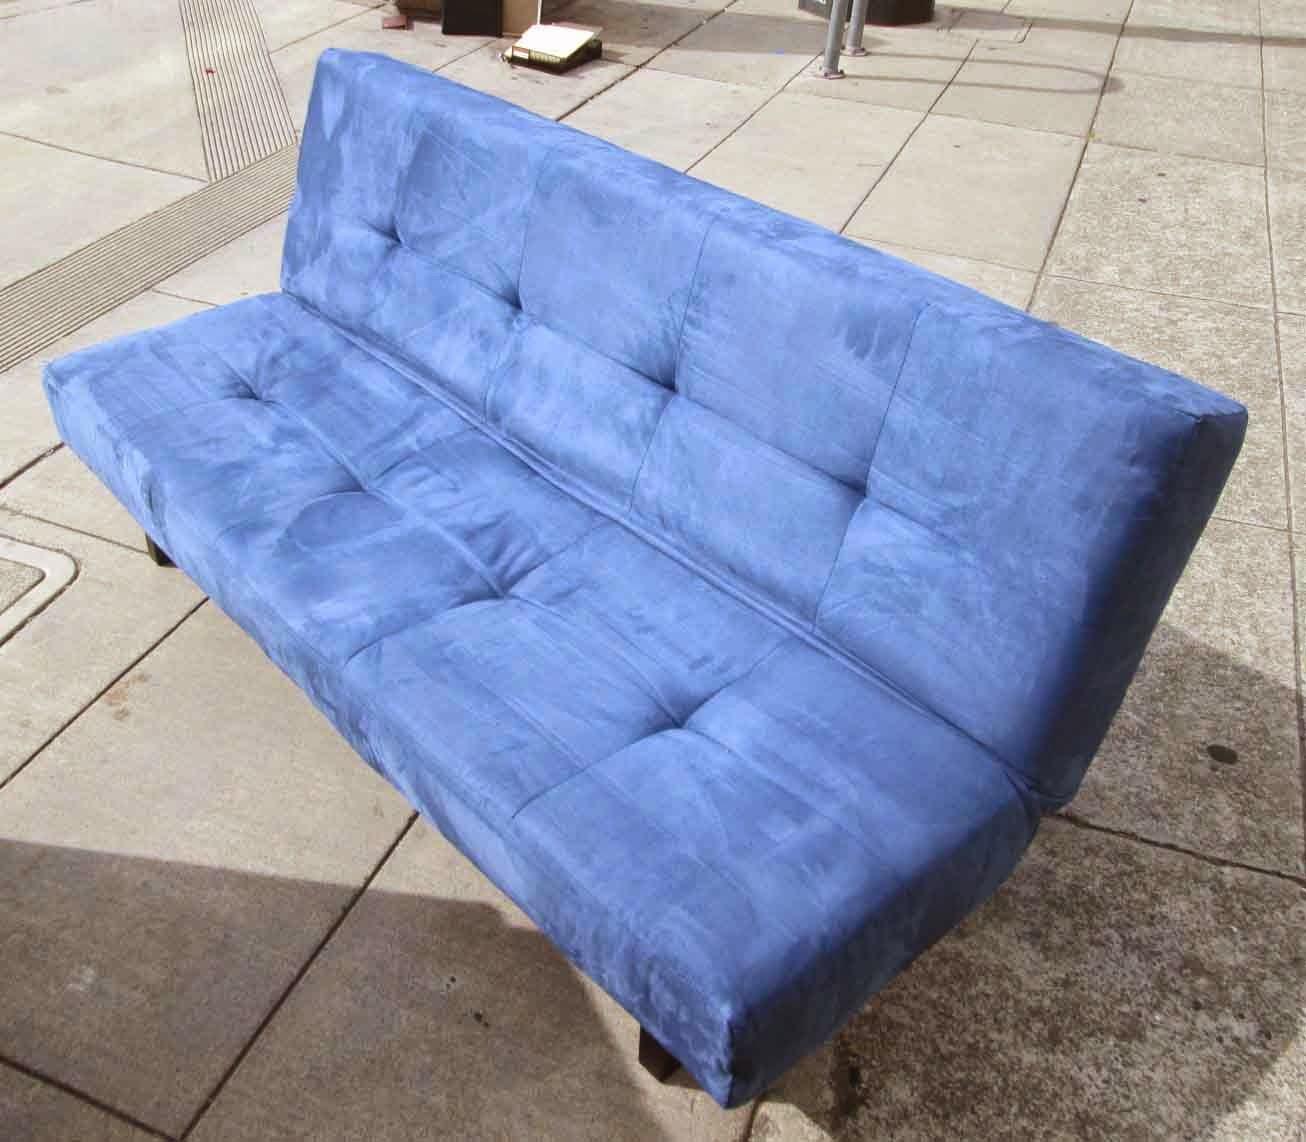 Uhuru furniture collectibles sold bright blue ikea fold for Ikea sofa bed 90